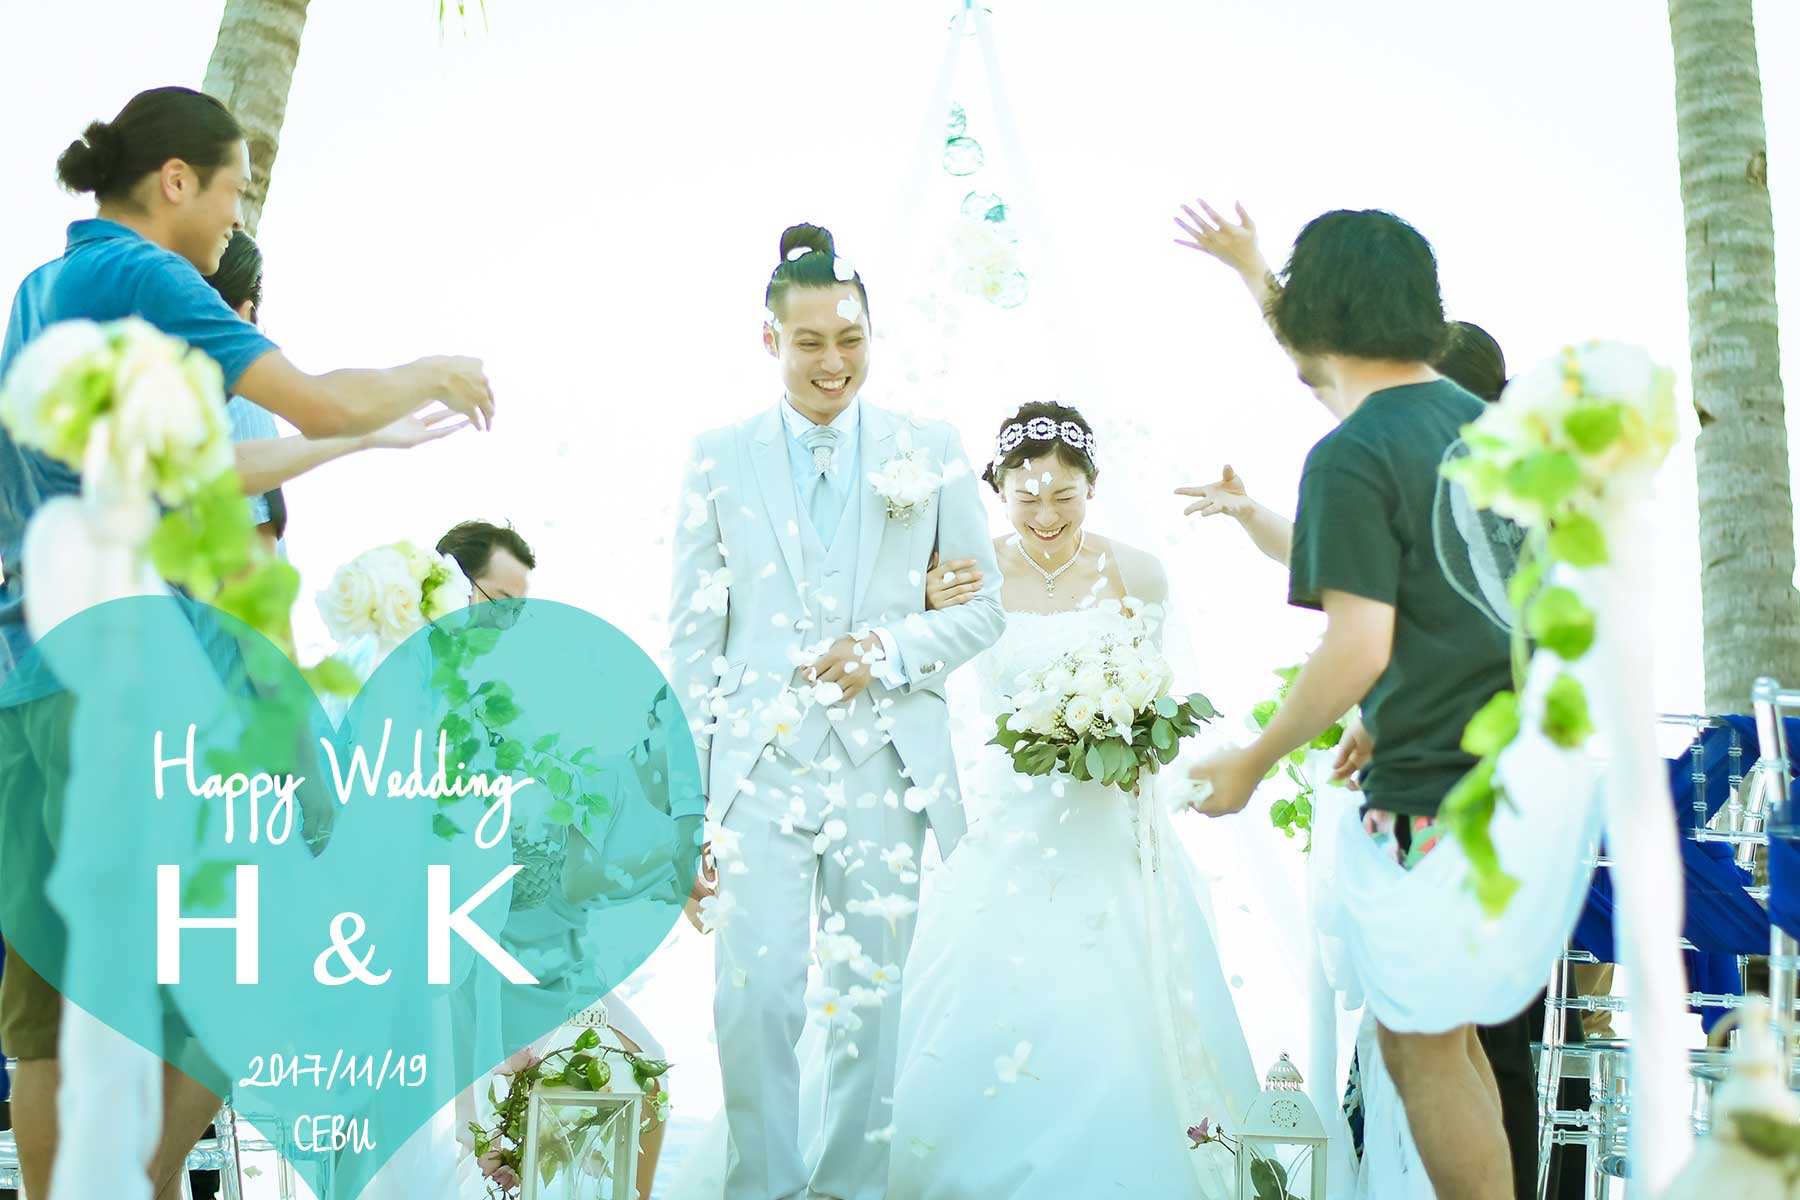 cebu-wedding-pacific-cebu